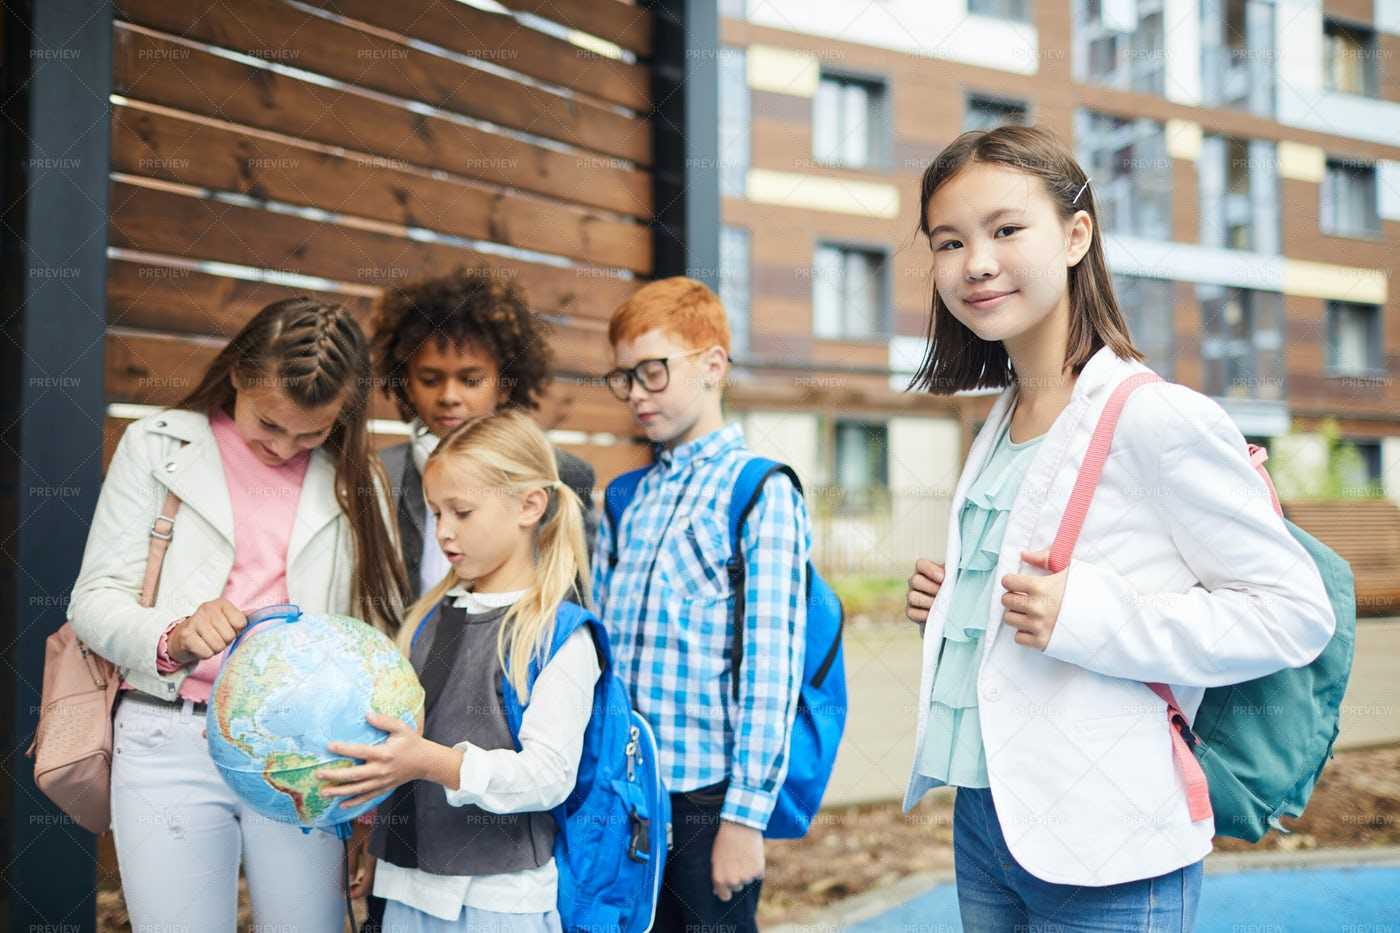 School Girls And Classmates: Stock Photos